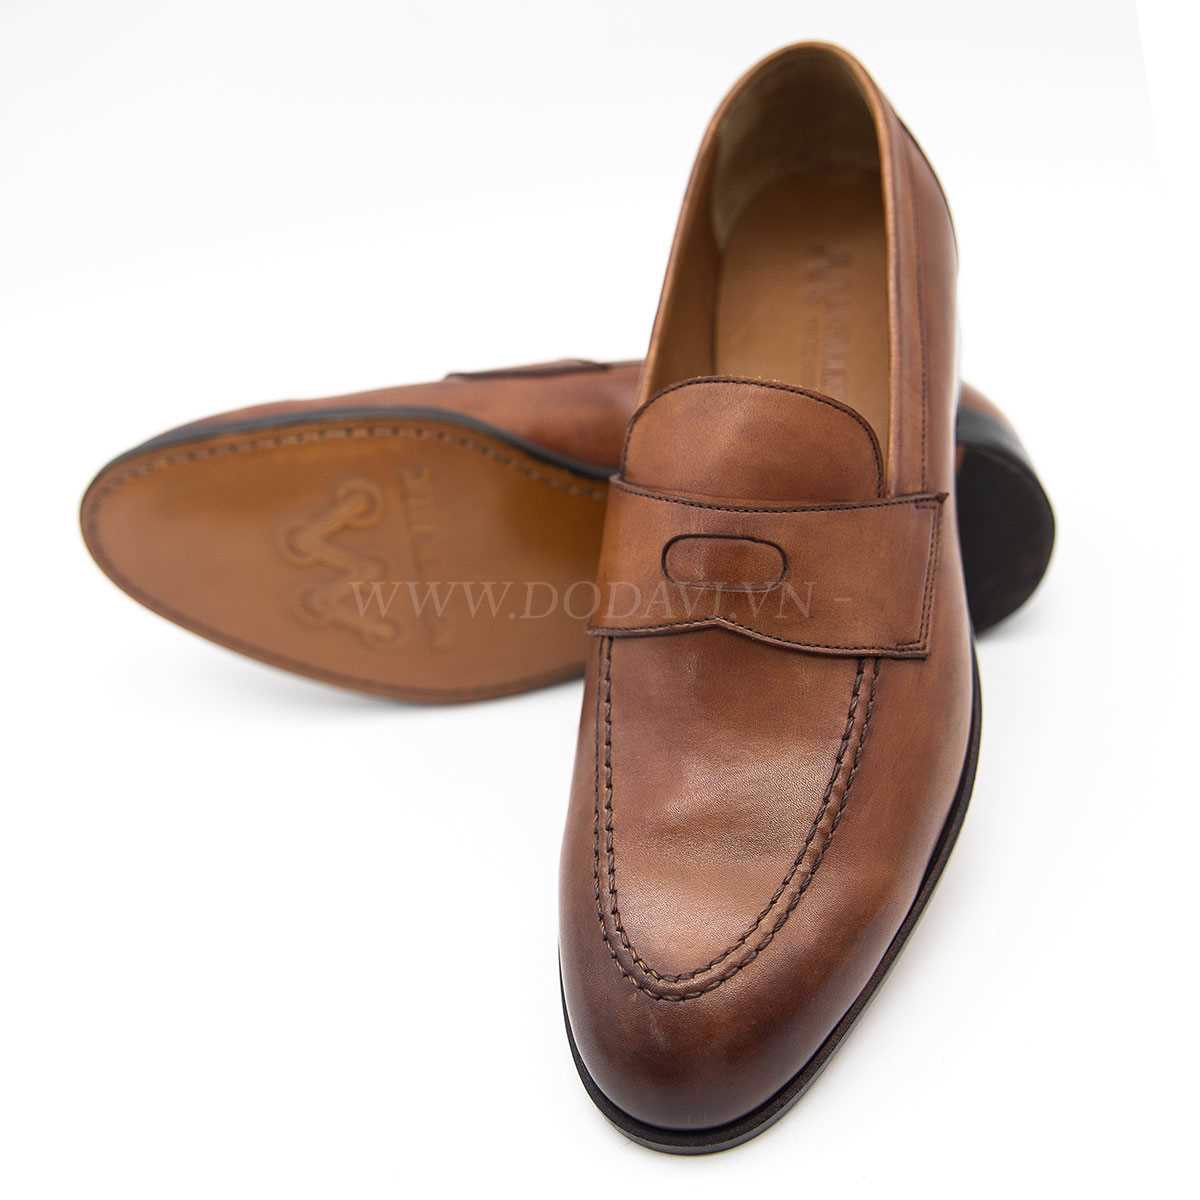 Giày đế da YS1109